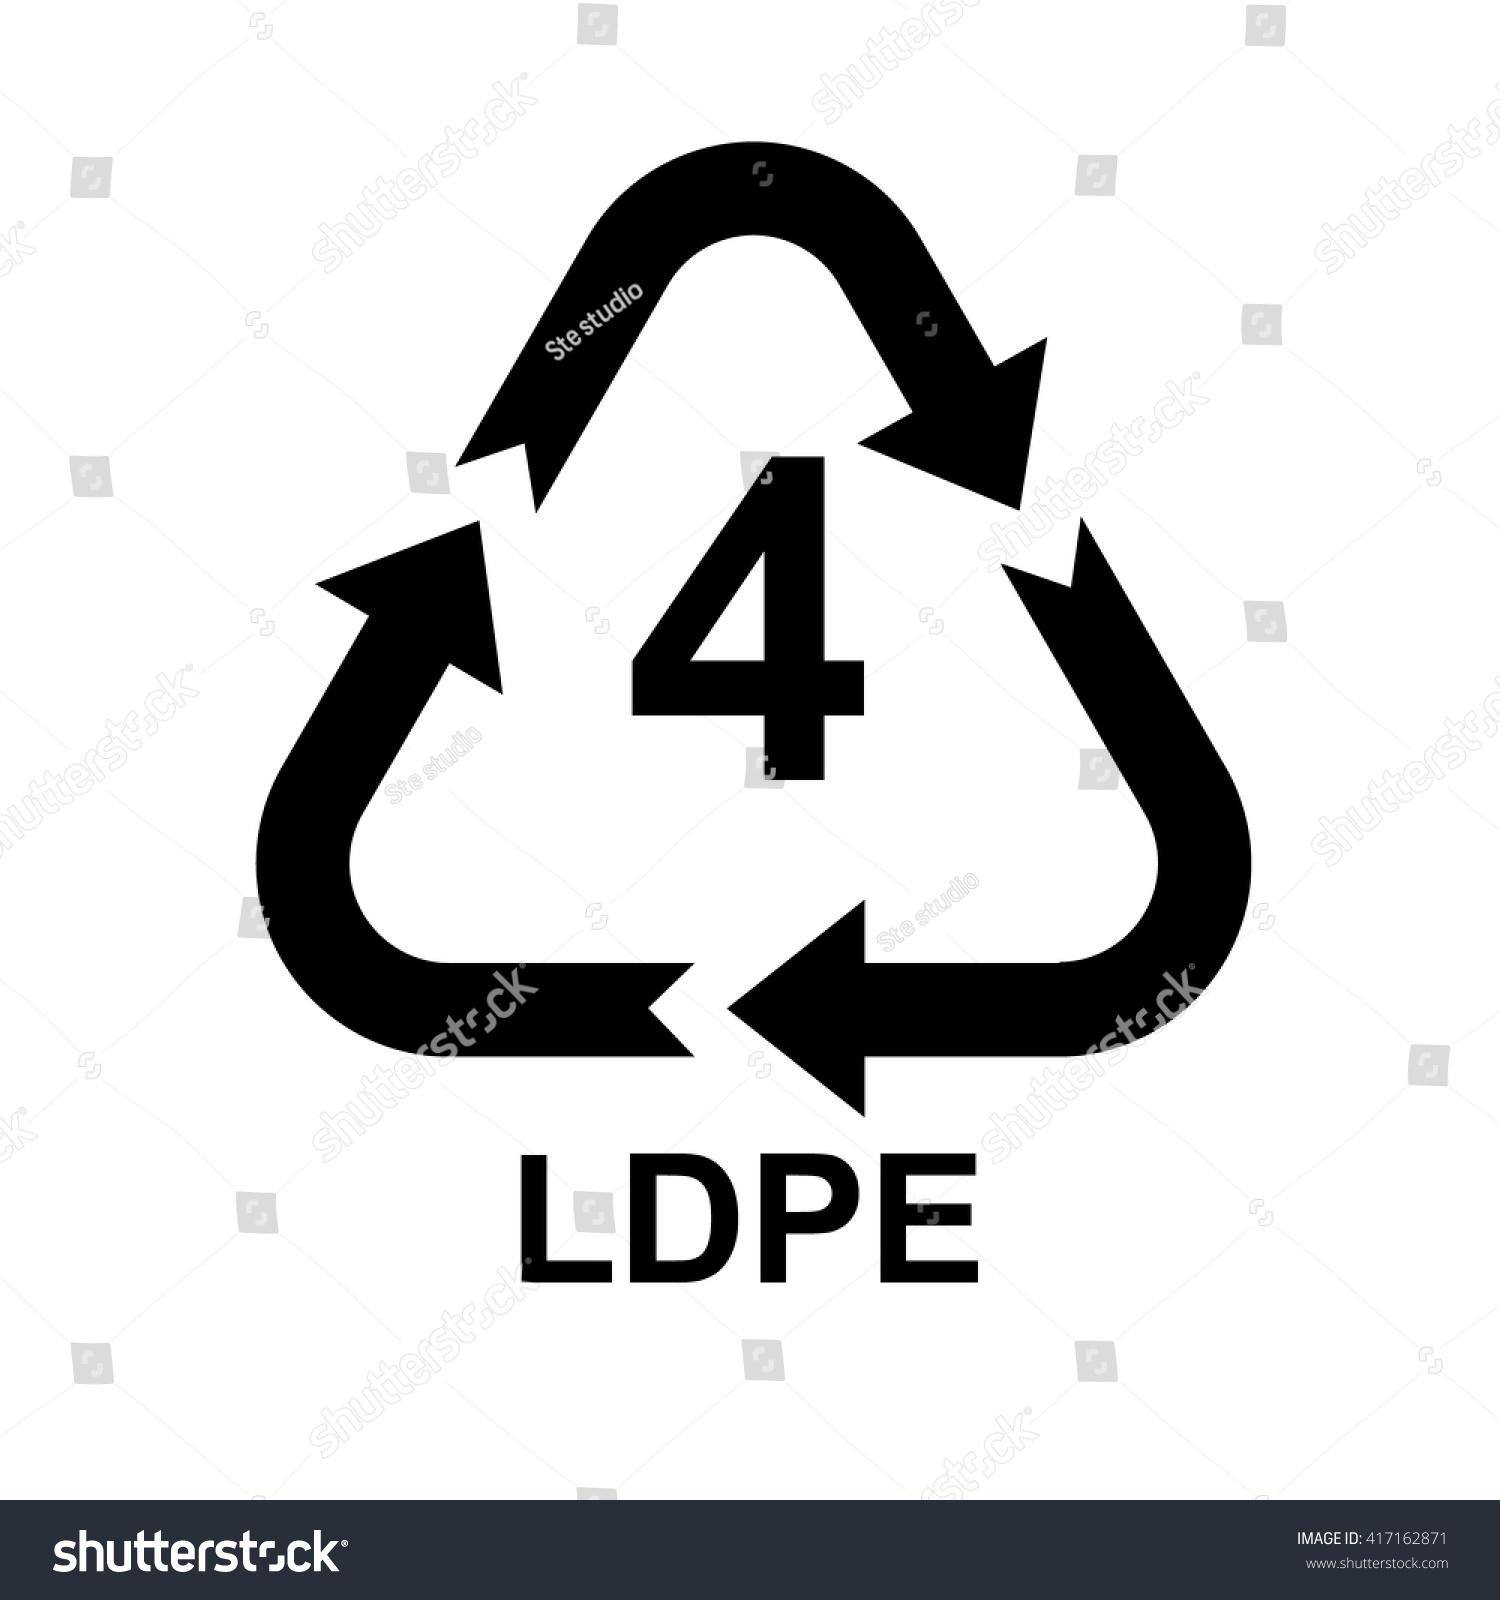 Plastic recycling symbol ldpe 4 vector stock vector 417162871 plastic recycling symbol ldpe 4 vector illustration biocorpaavc Choice Image